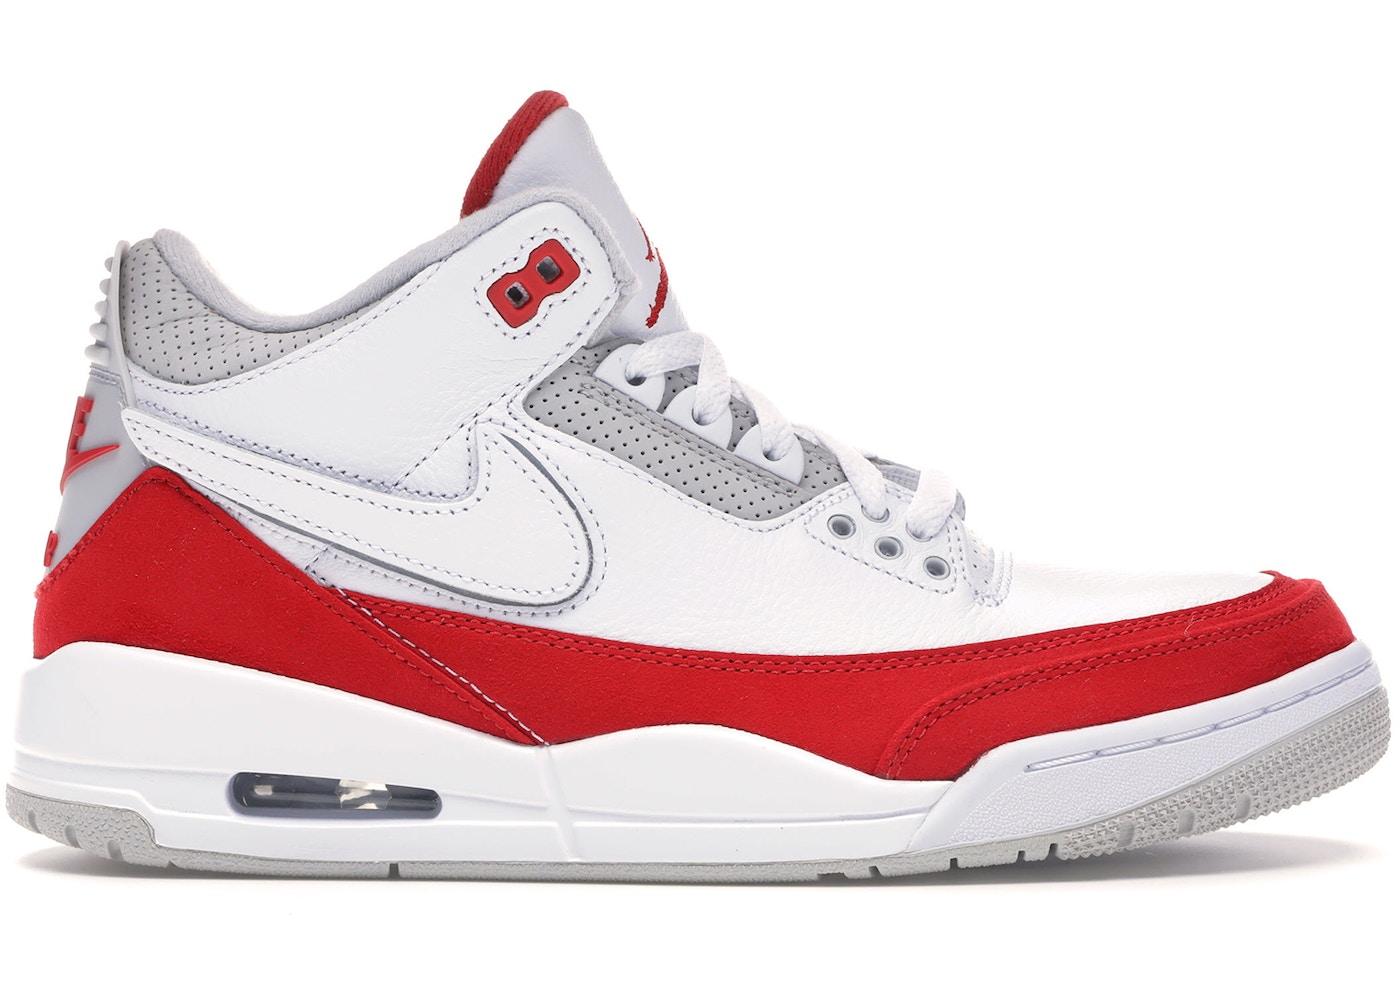 low priced 408dd 4918b Jordan 3 Retro Tinker White University Red